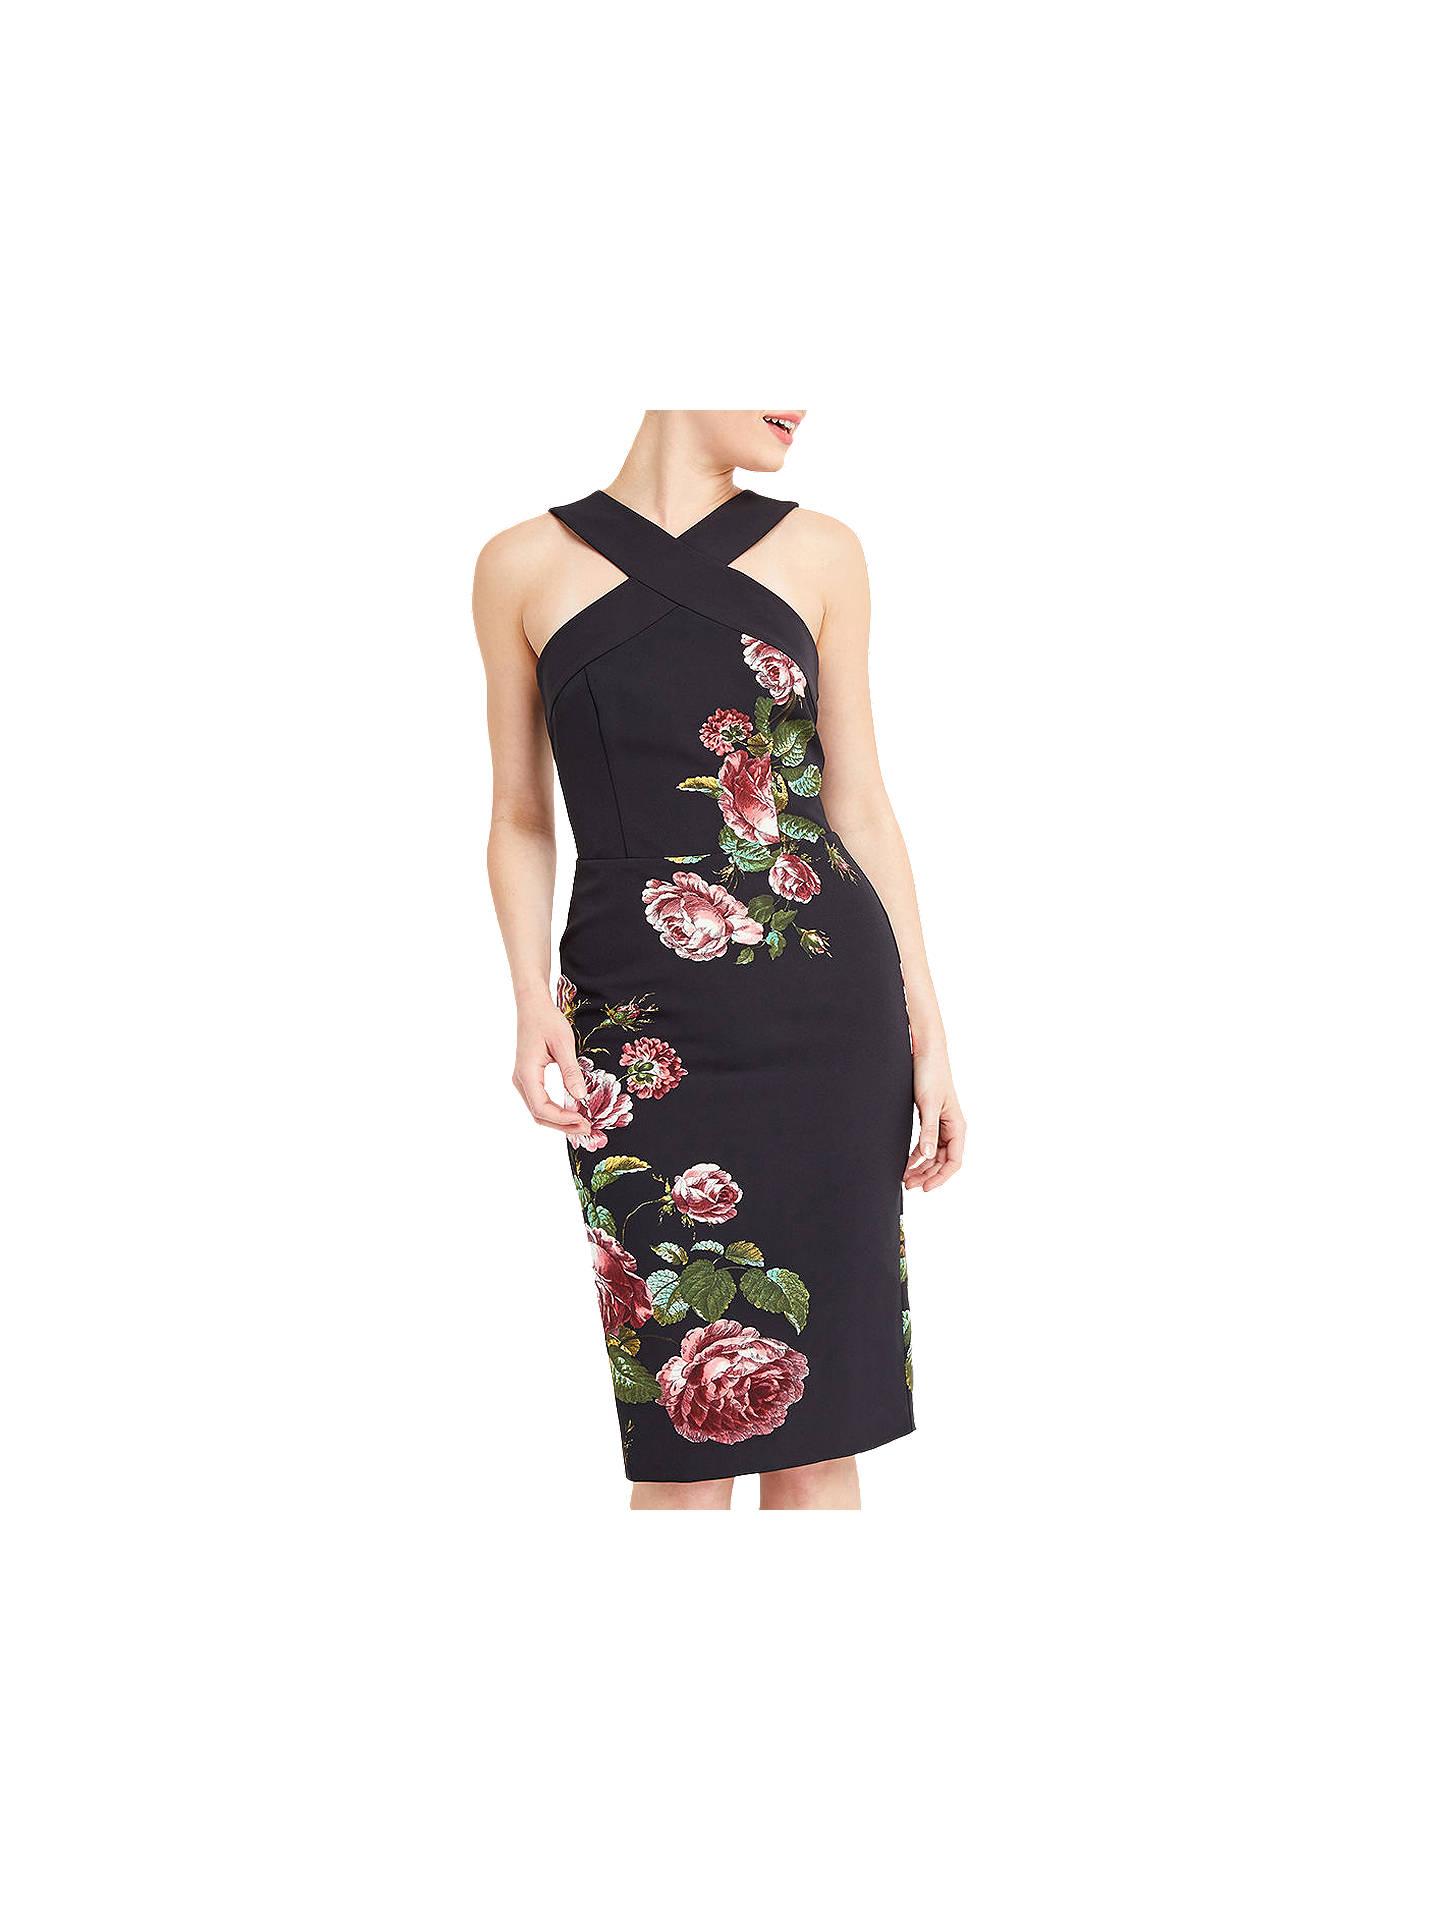 c998b867458d Buy Oasis Royal Worcester Collection Floral Pencil Dress, Black/Multi, 6  Online at ...